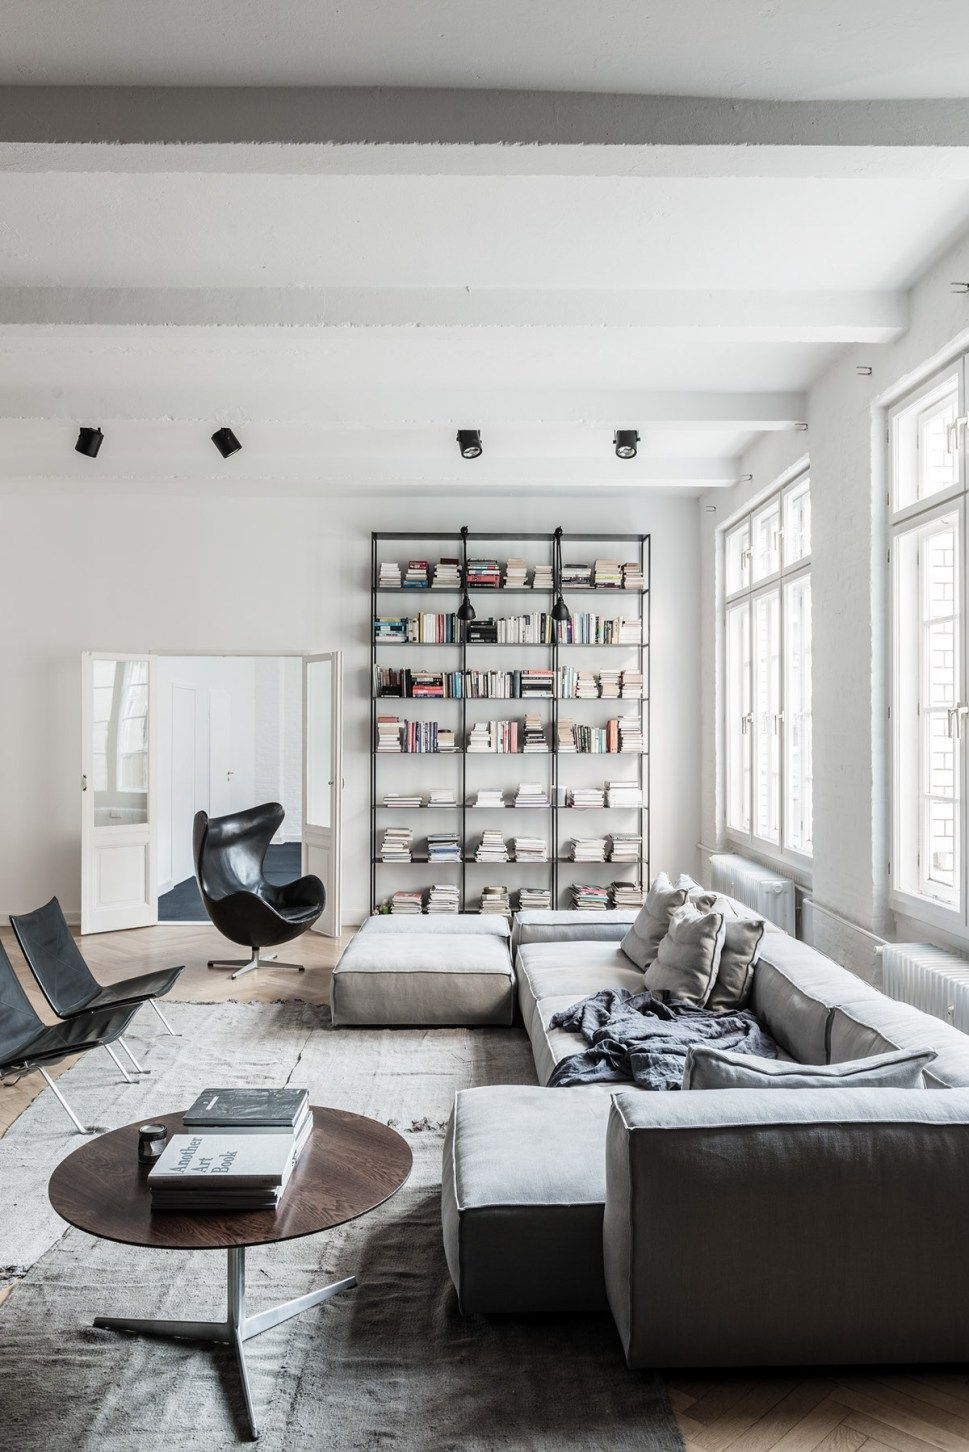 decordemon: A loft in Berlin | Decorating Ideas | Pinterest | Lofts ...